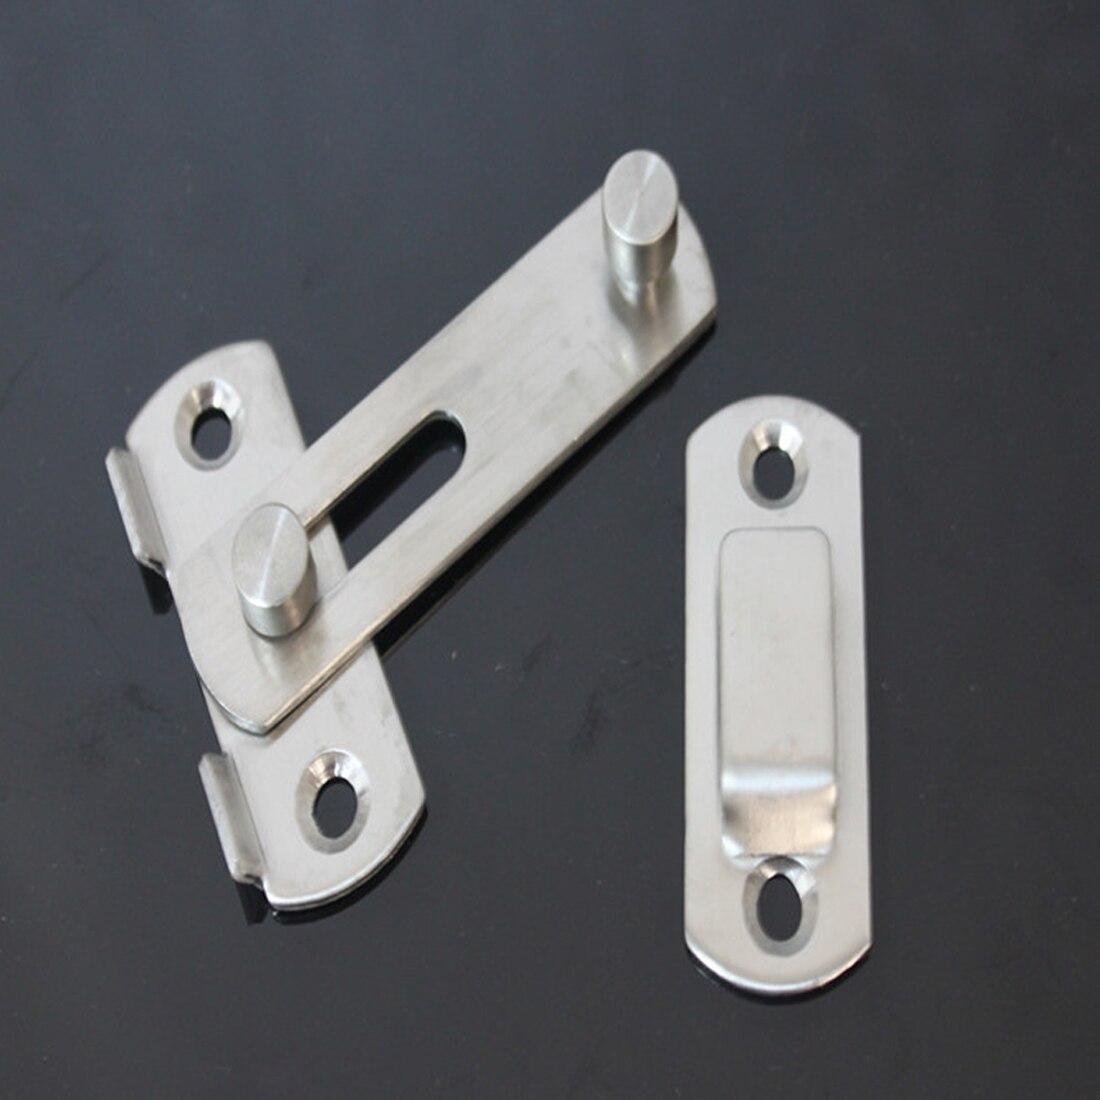 Stainless Steel Hasp Latch Lock Sliding Door Lock For Window Cabinet